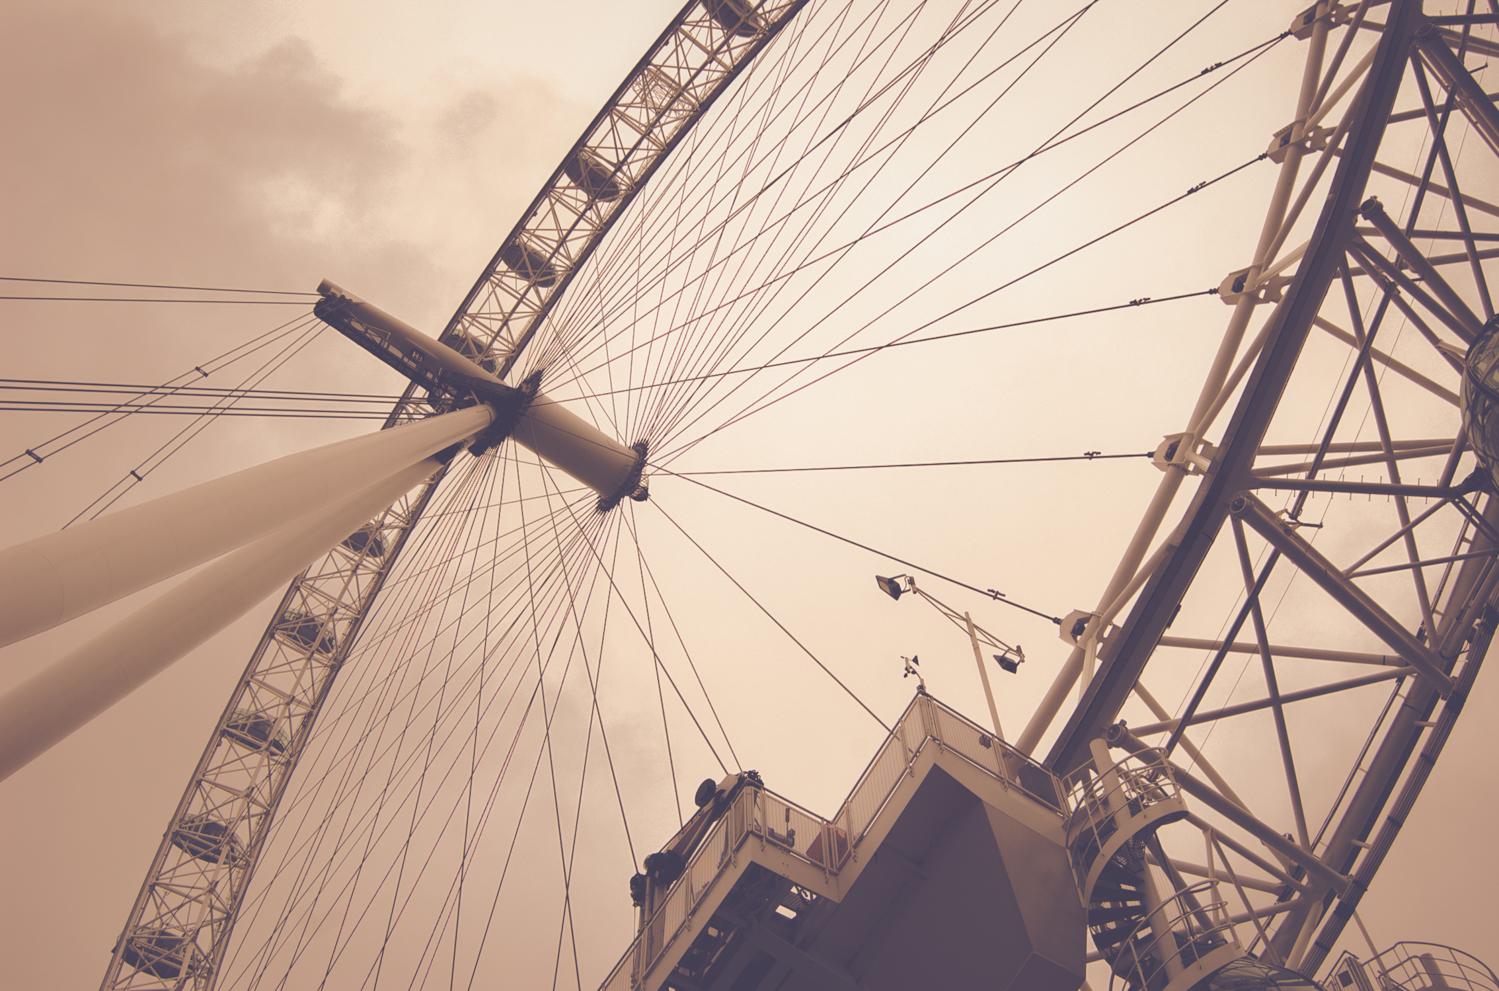 luzod-design-co-mae-london-eye.jpg